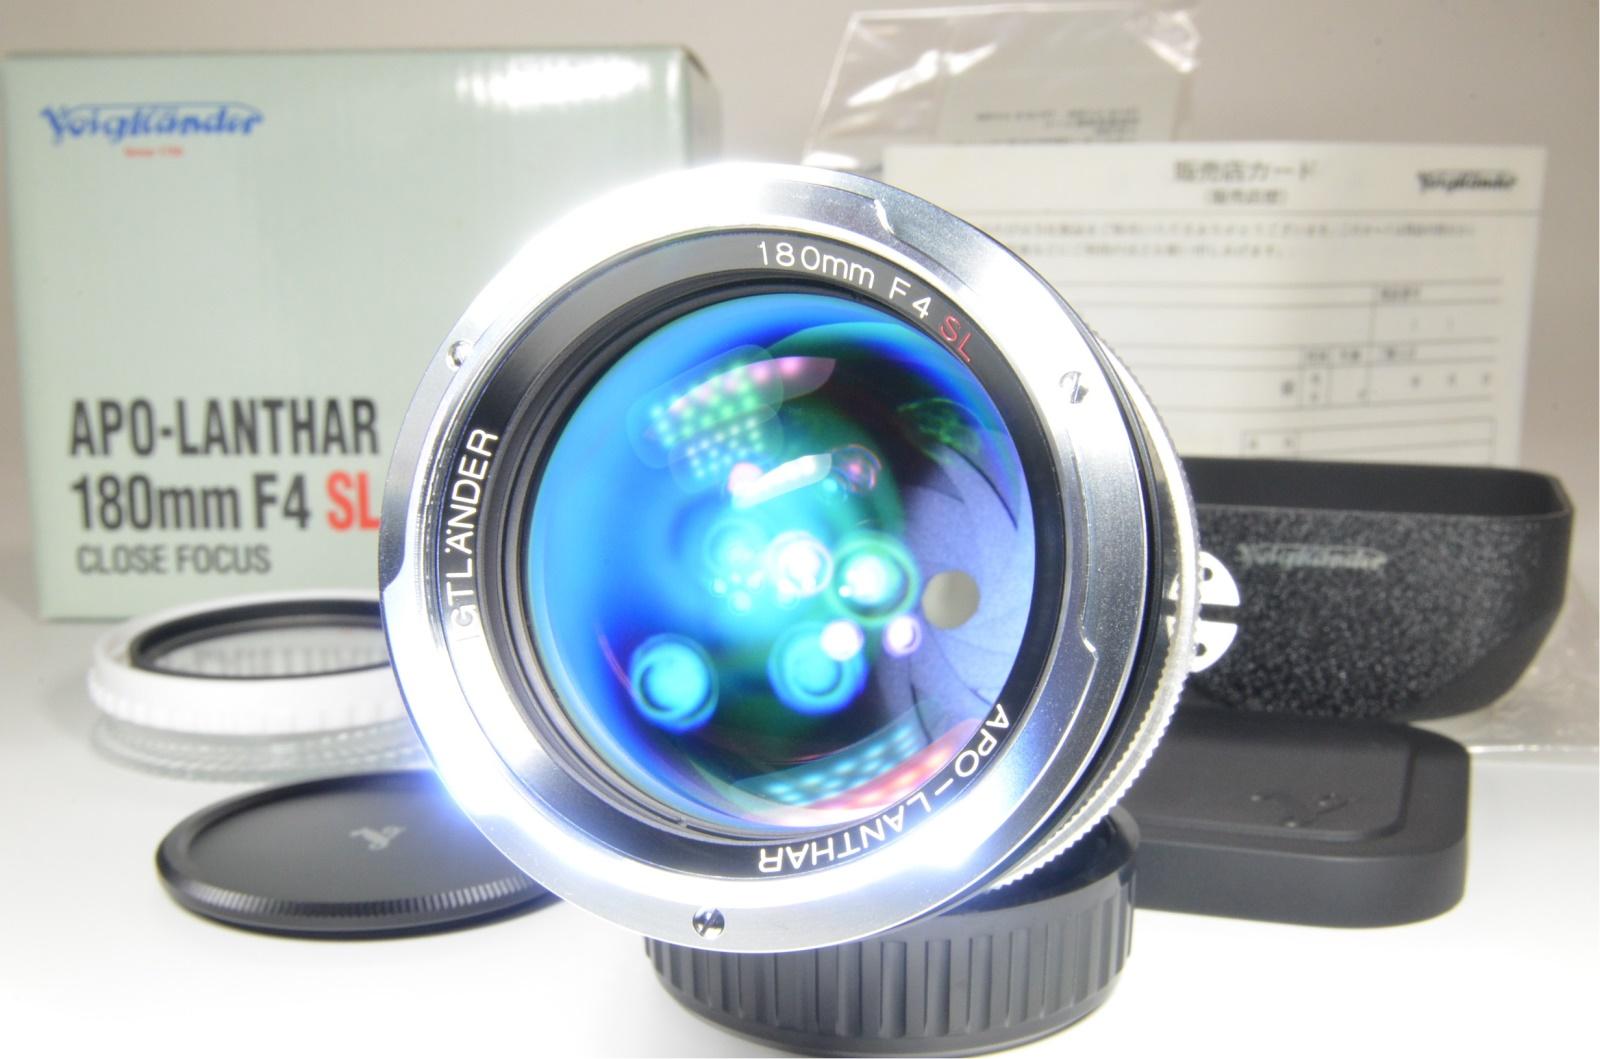 voigtlander apo-lanthar 180mm f4 sl for ai-s nikon w/ lens hood